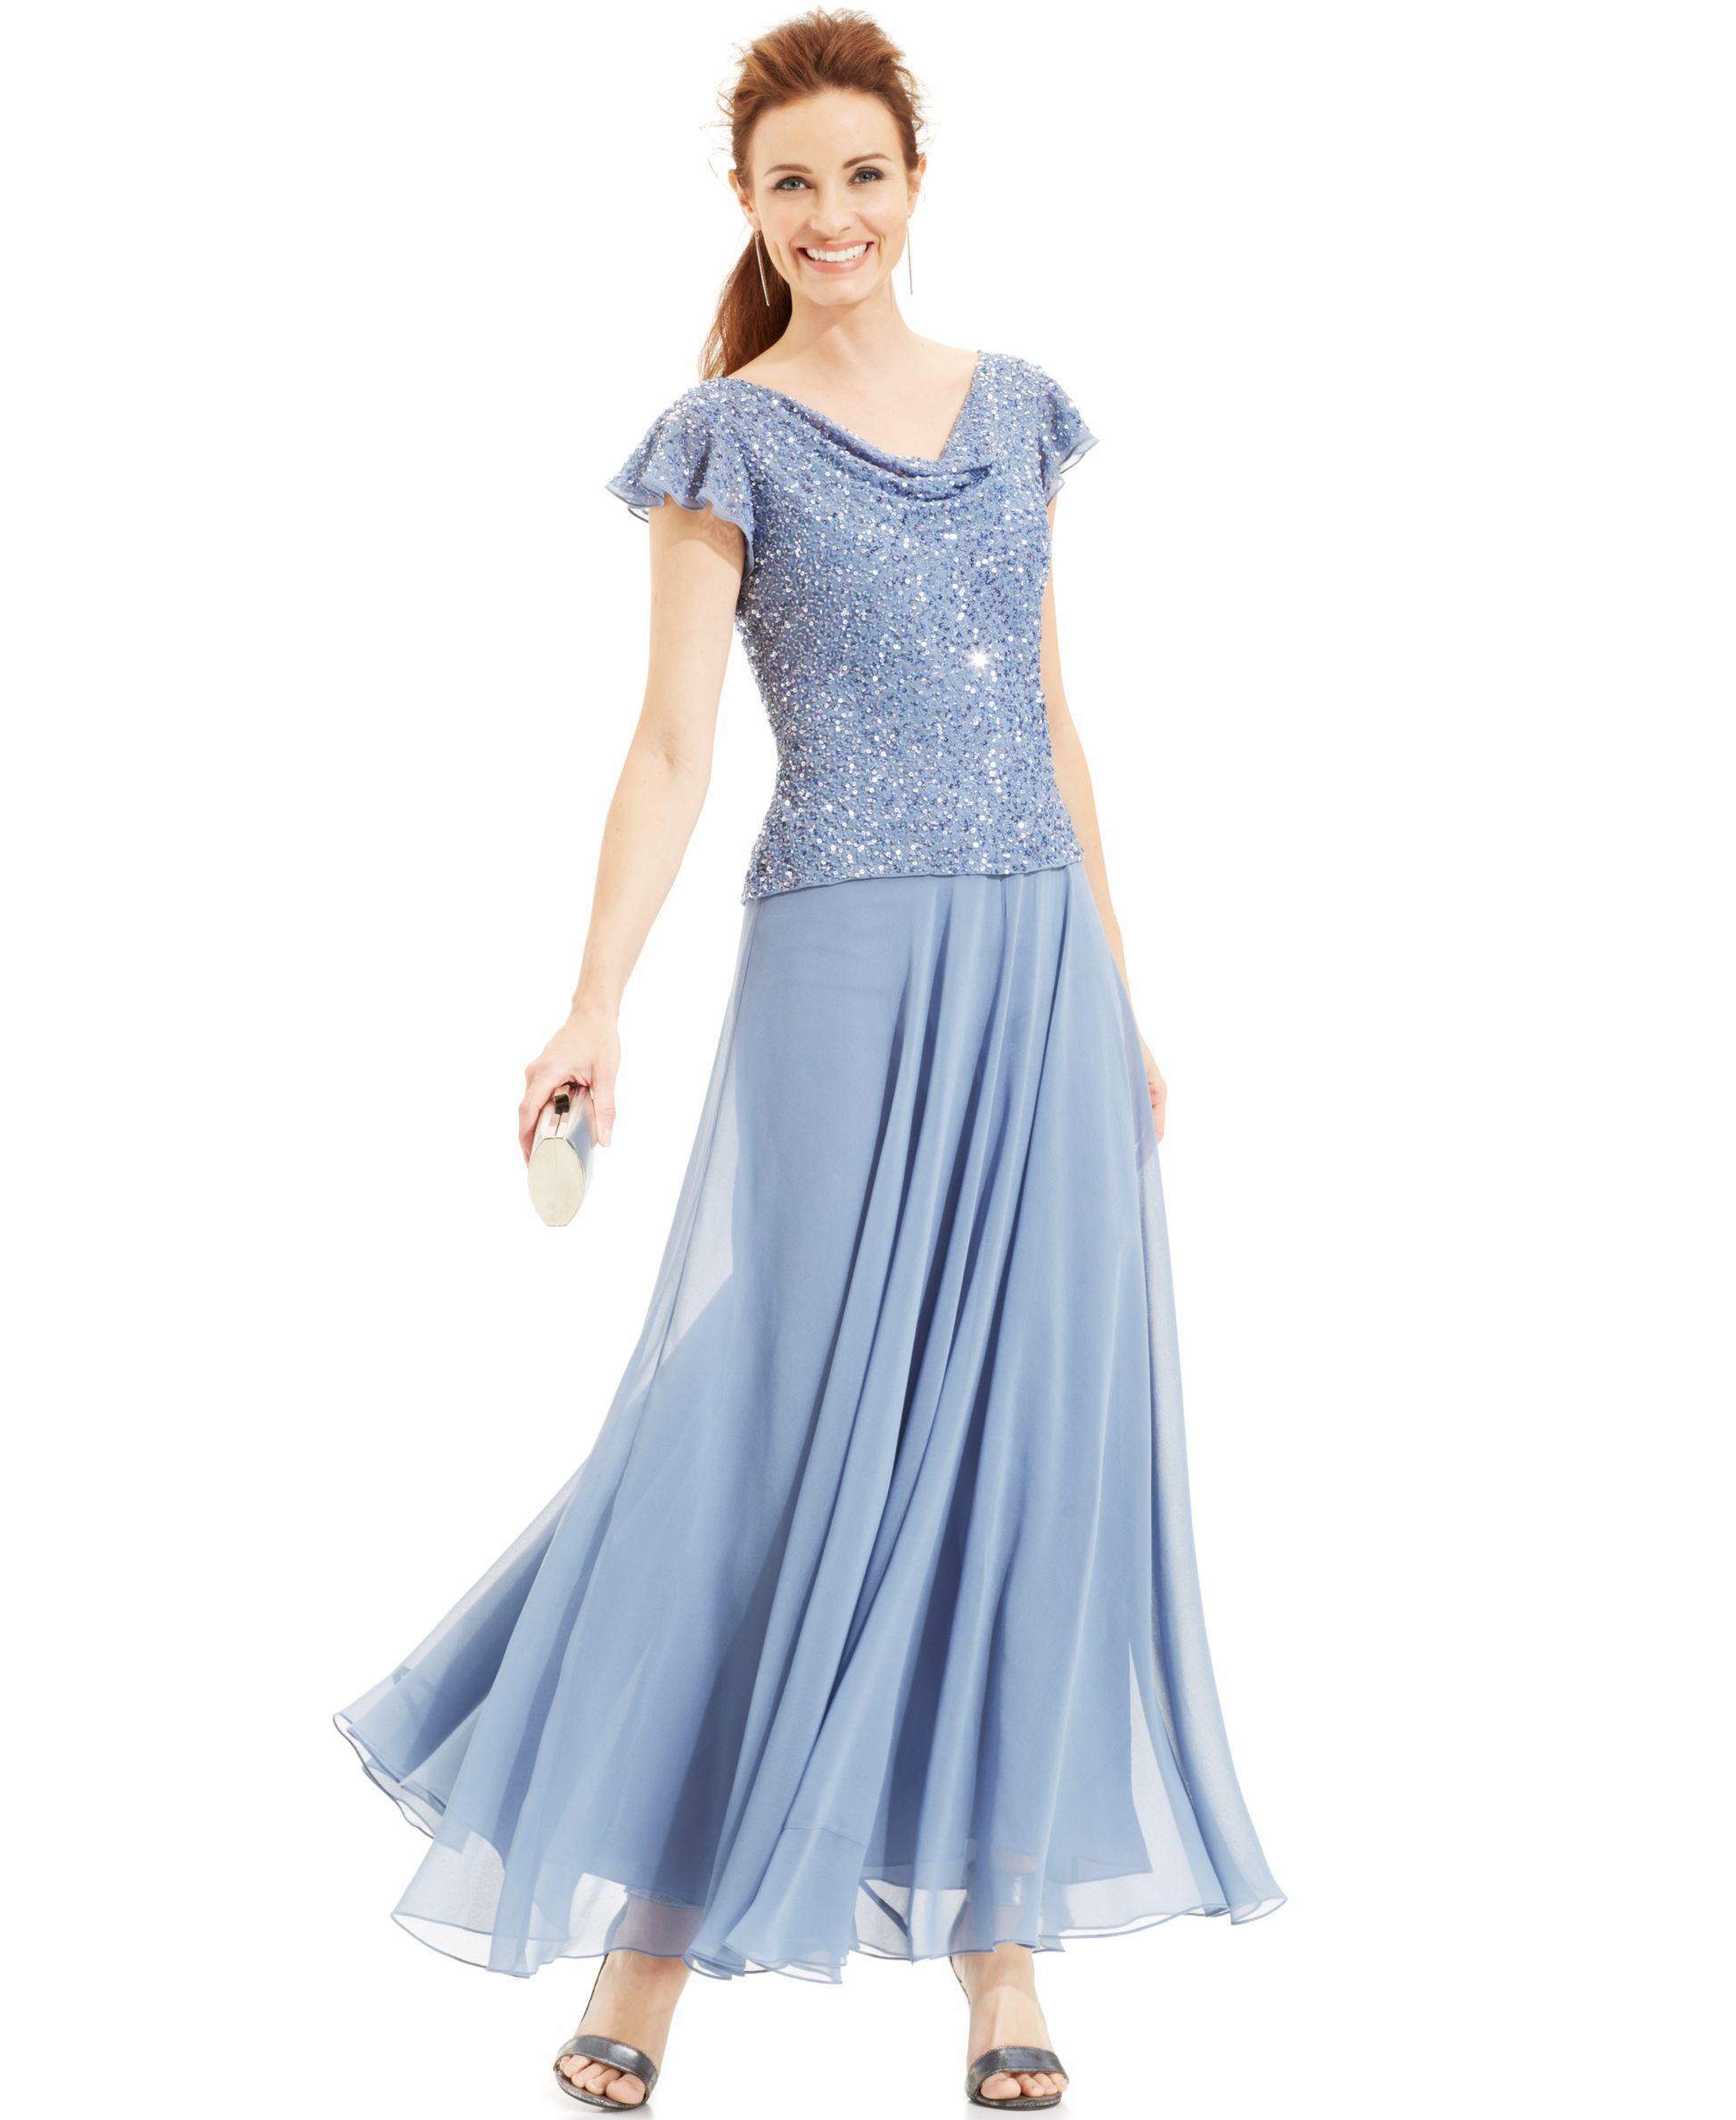 Nice Von Maur Mother Of The Bride Dresses Vignette - All Wedding ...